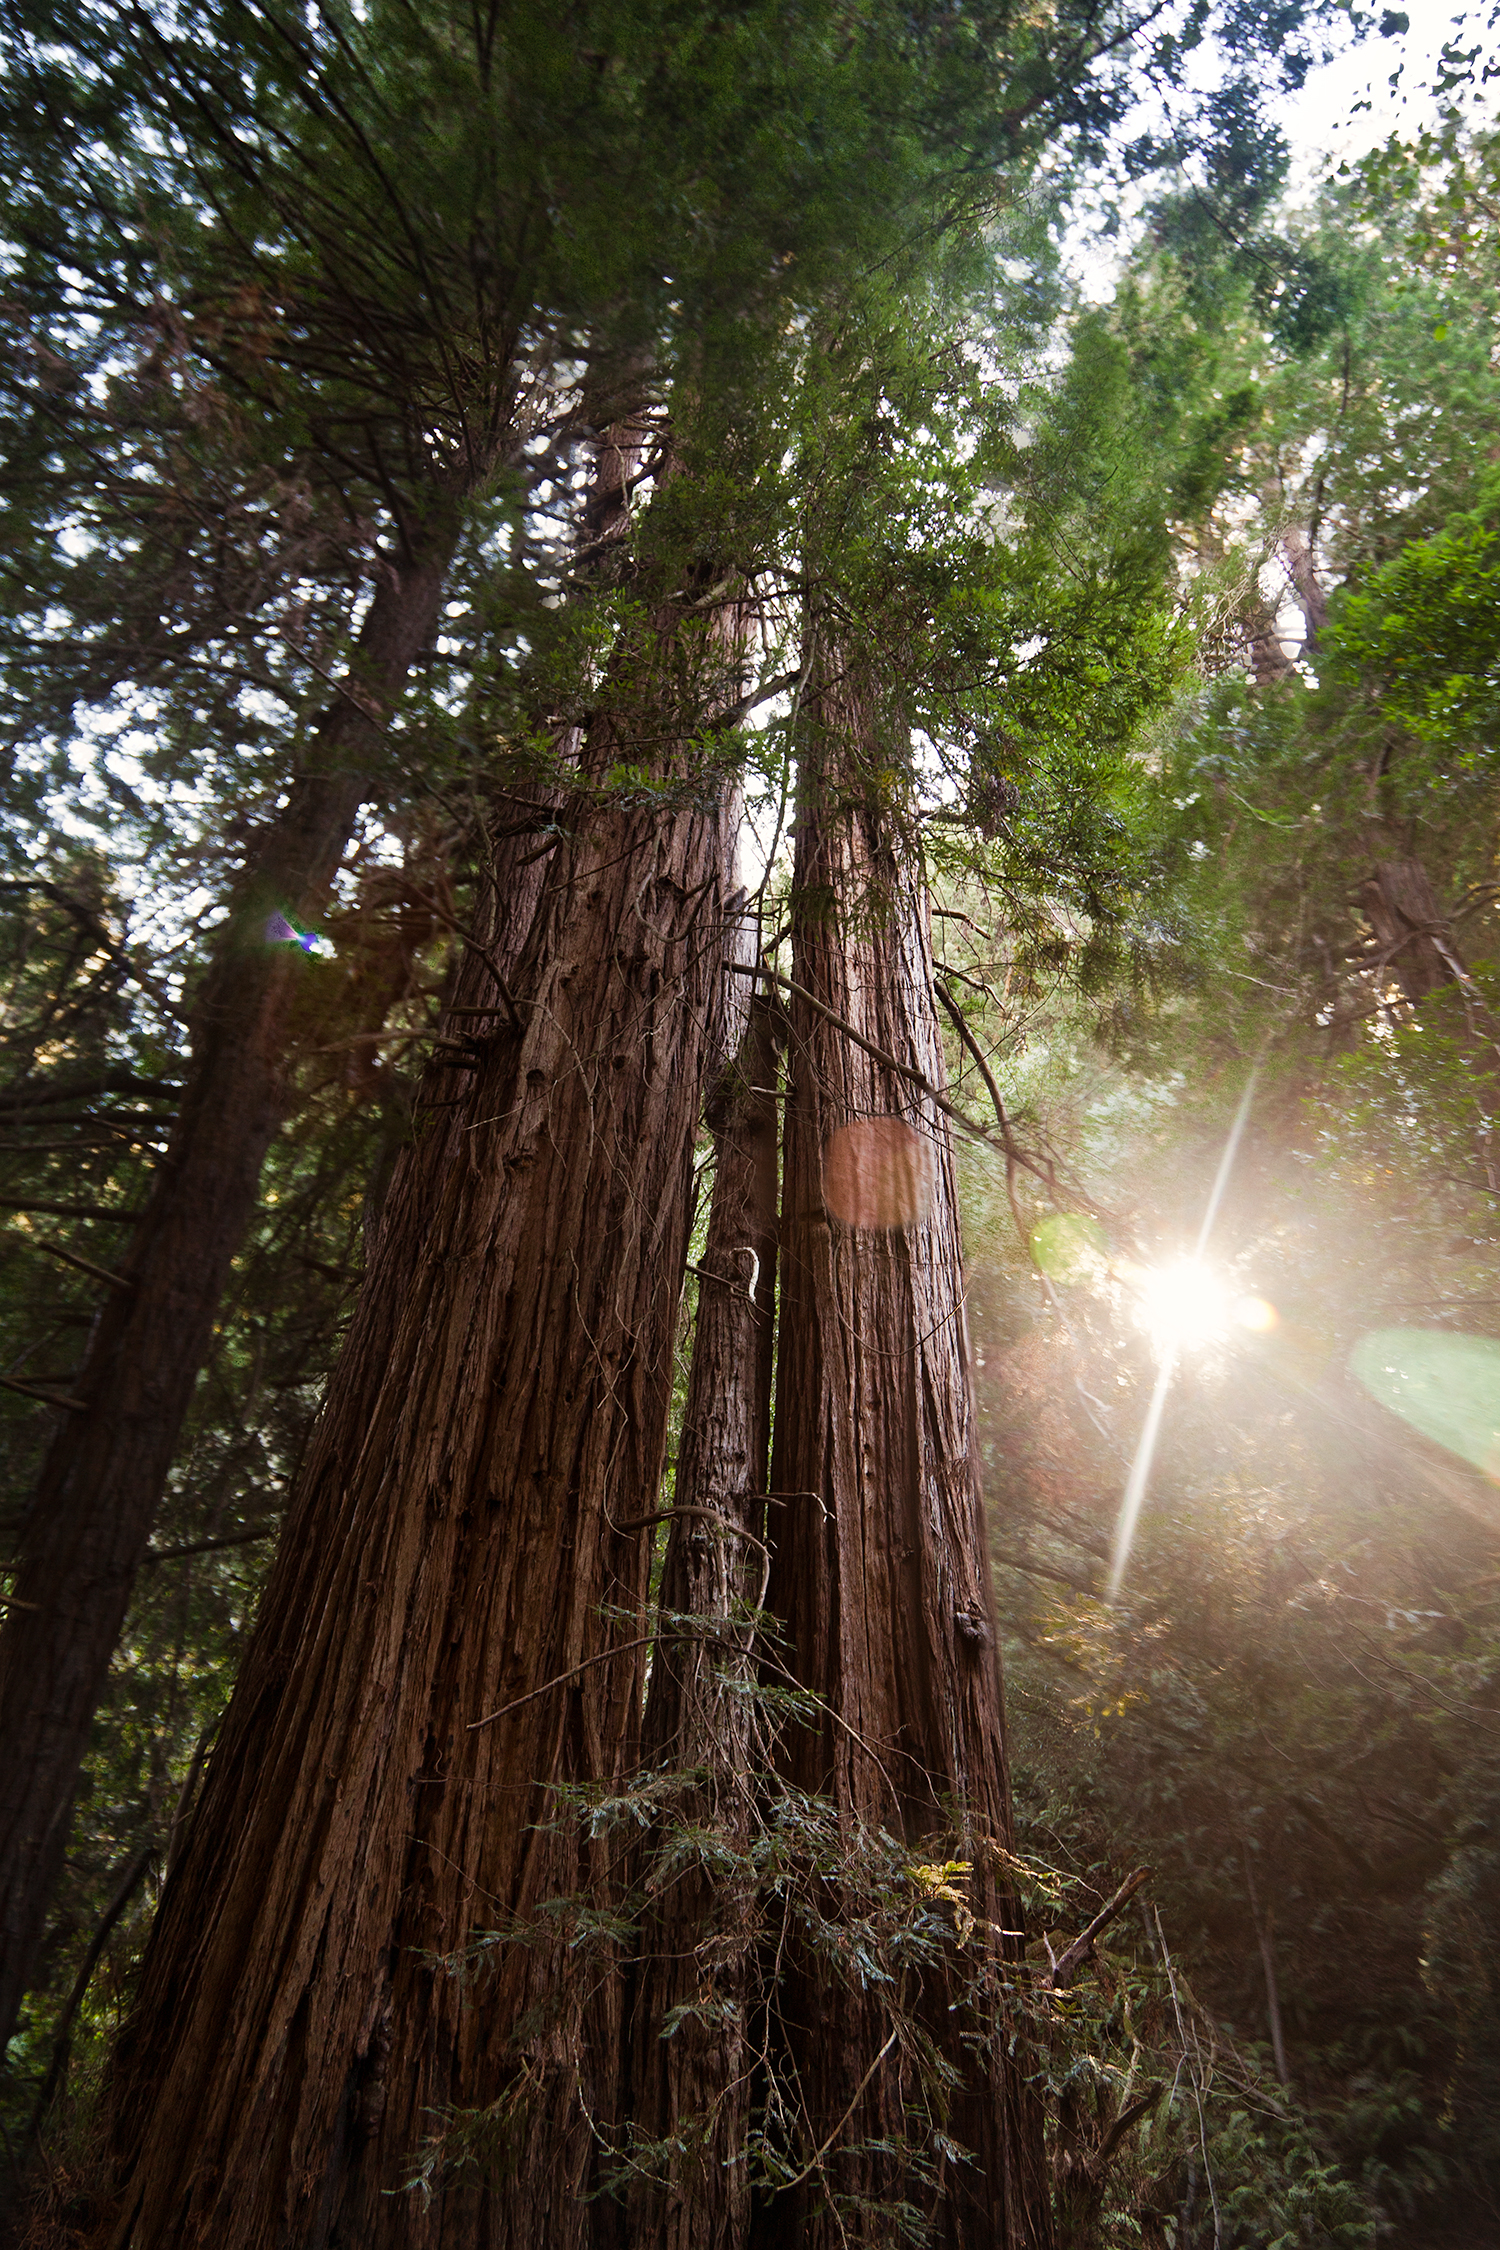 muir woods redwood tree and sunlight.jpg